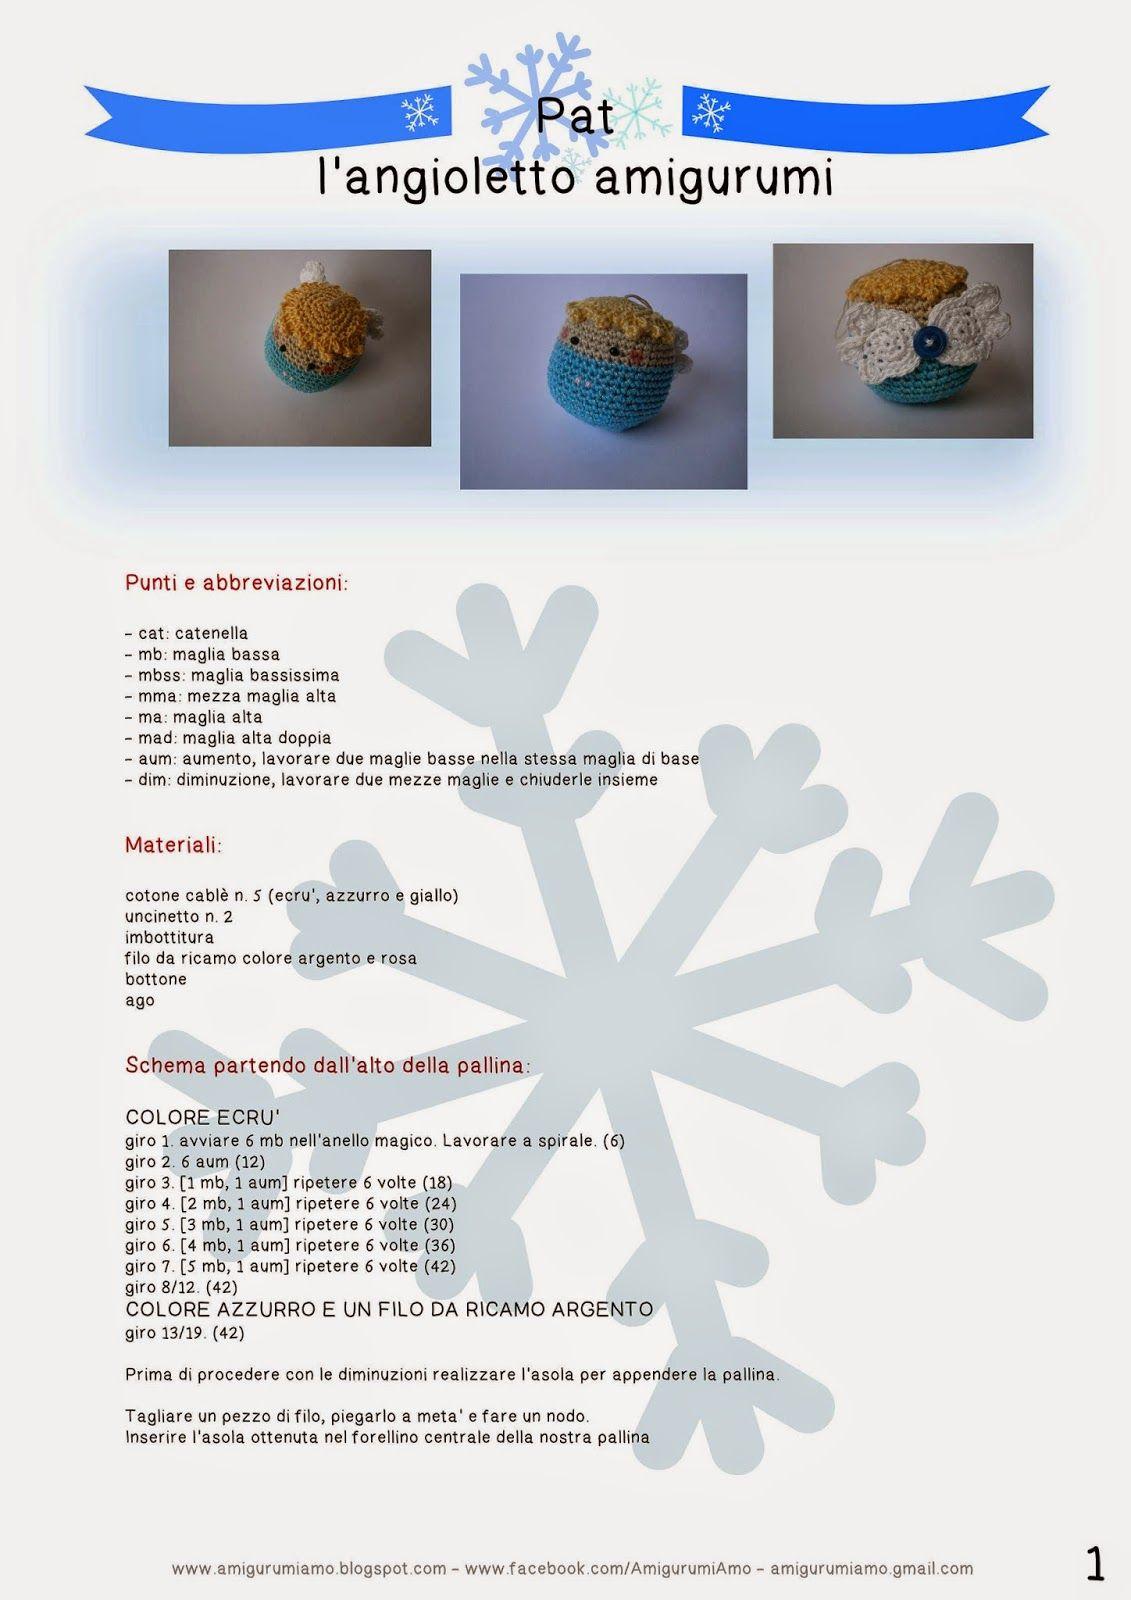 Angioletto similThun - free amigurumi scheme in Italian ... | 1600x1131